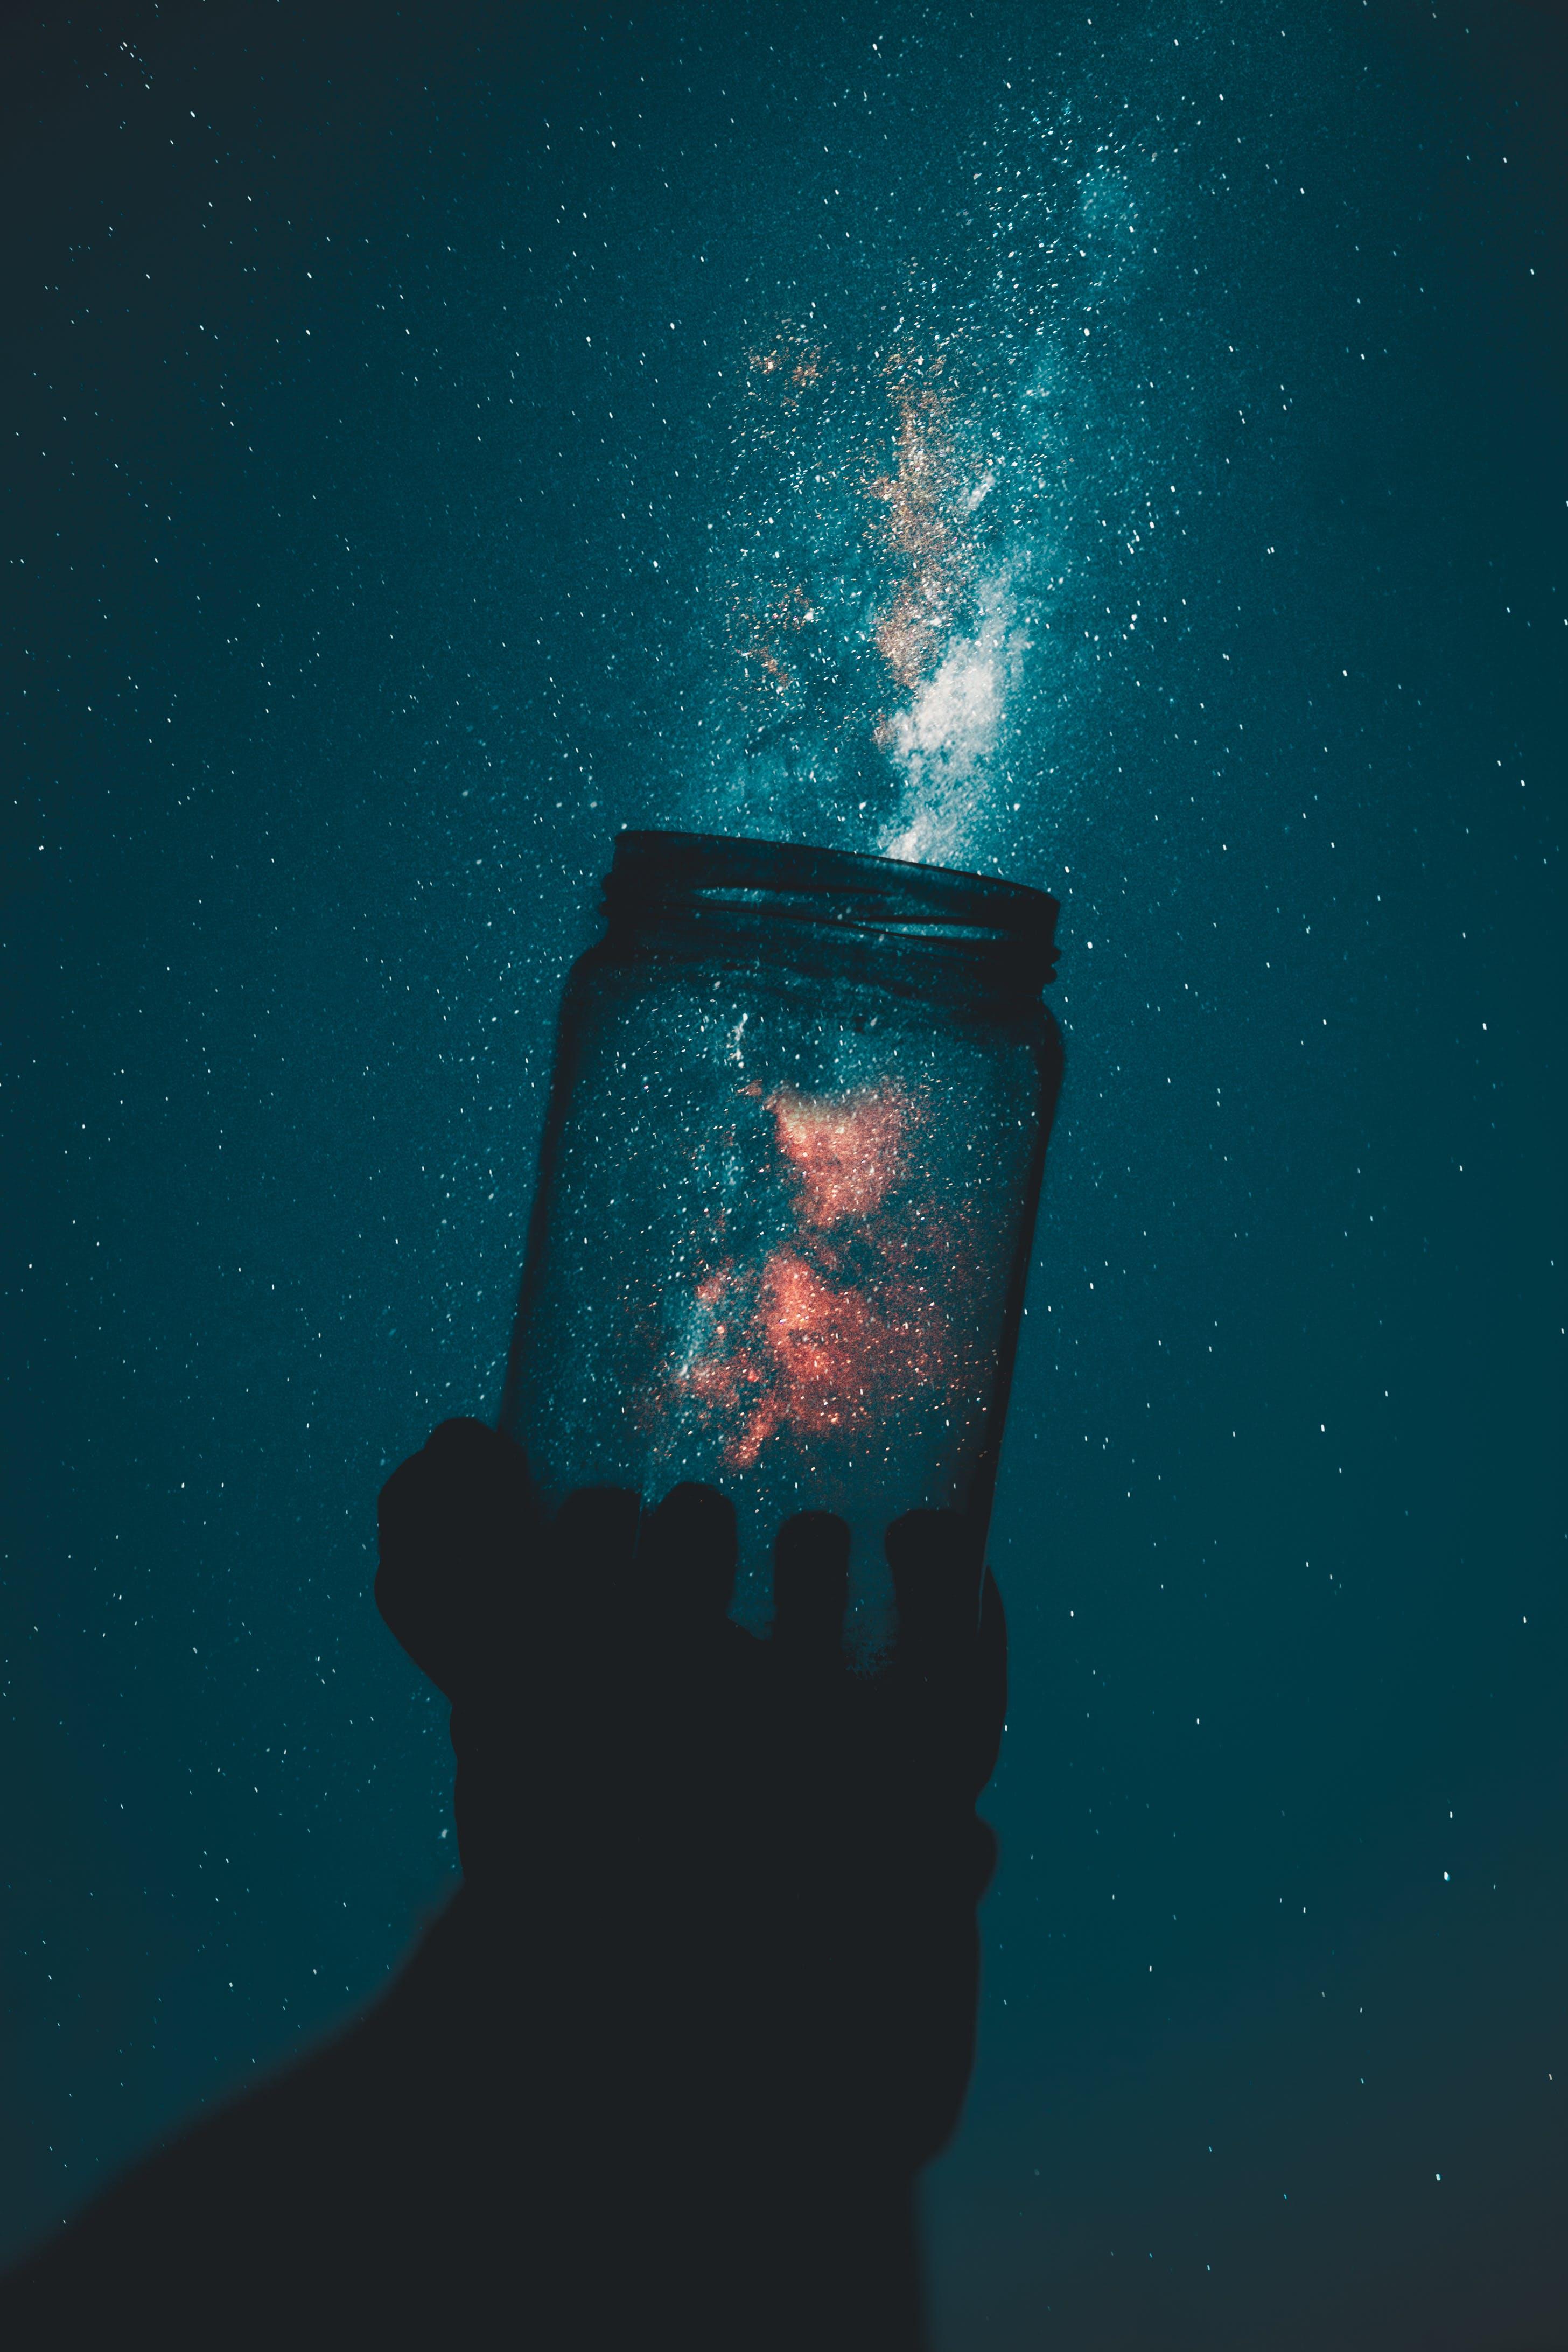 astronomi, galakse, galaxy